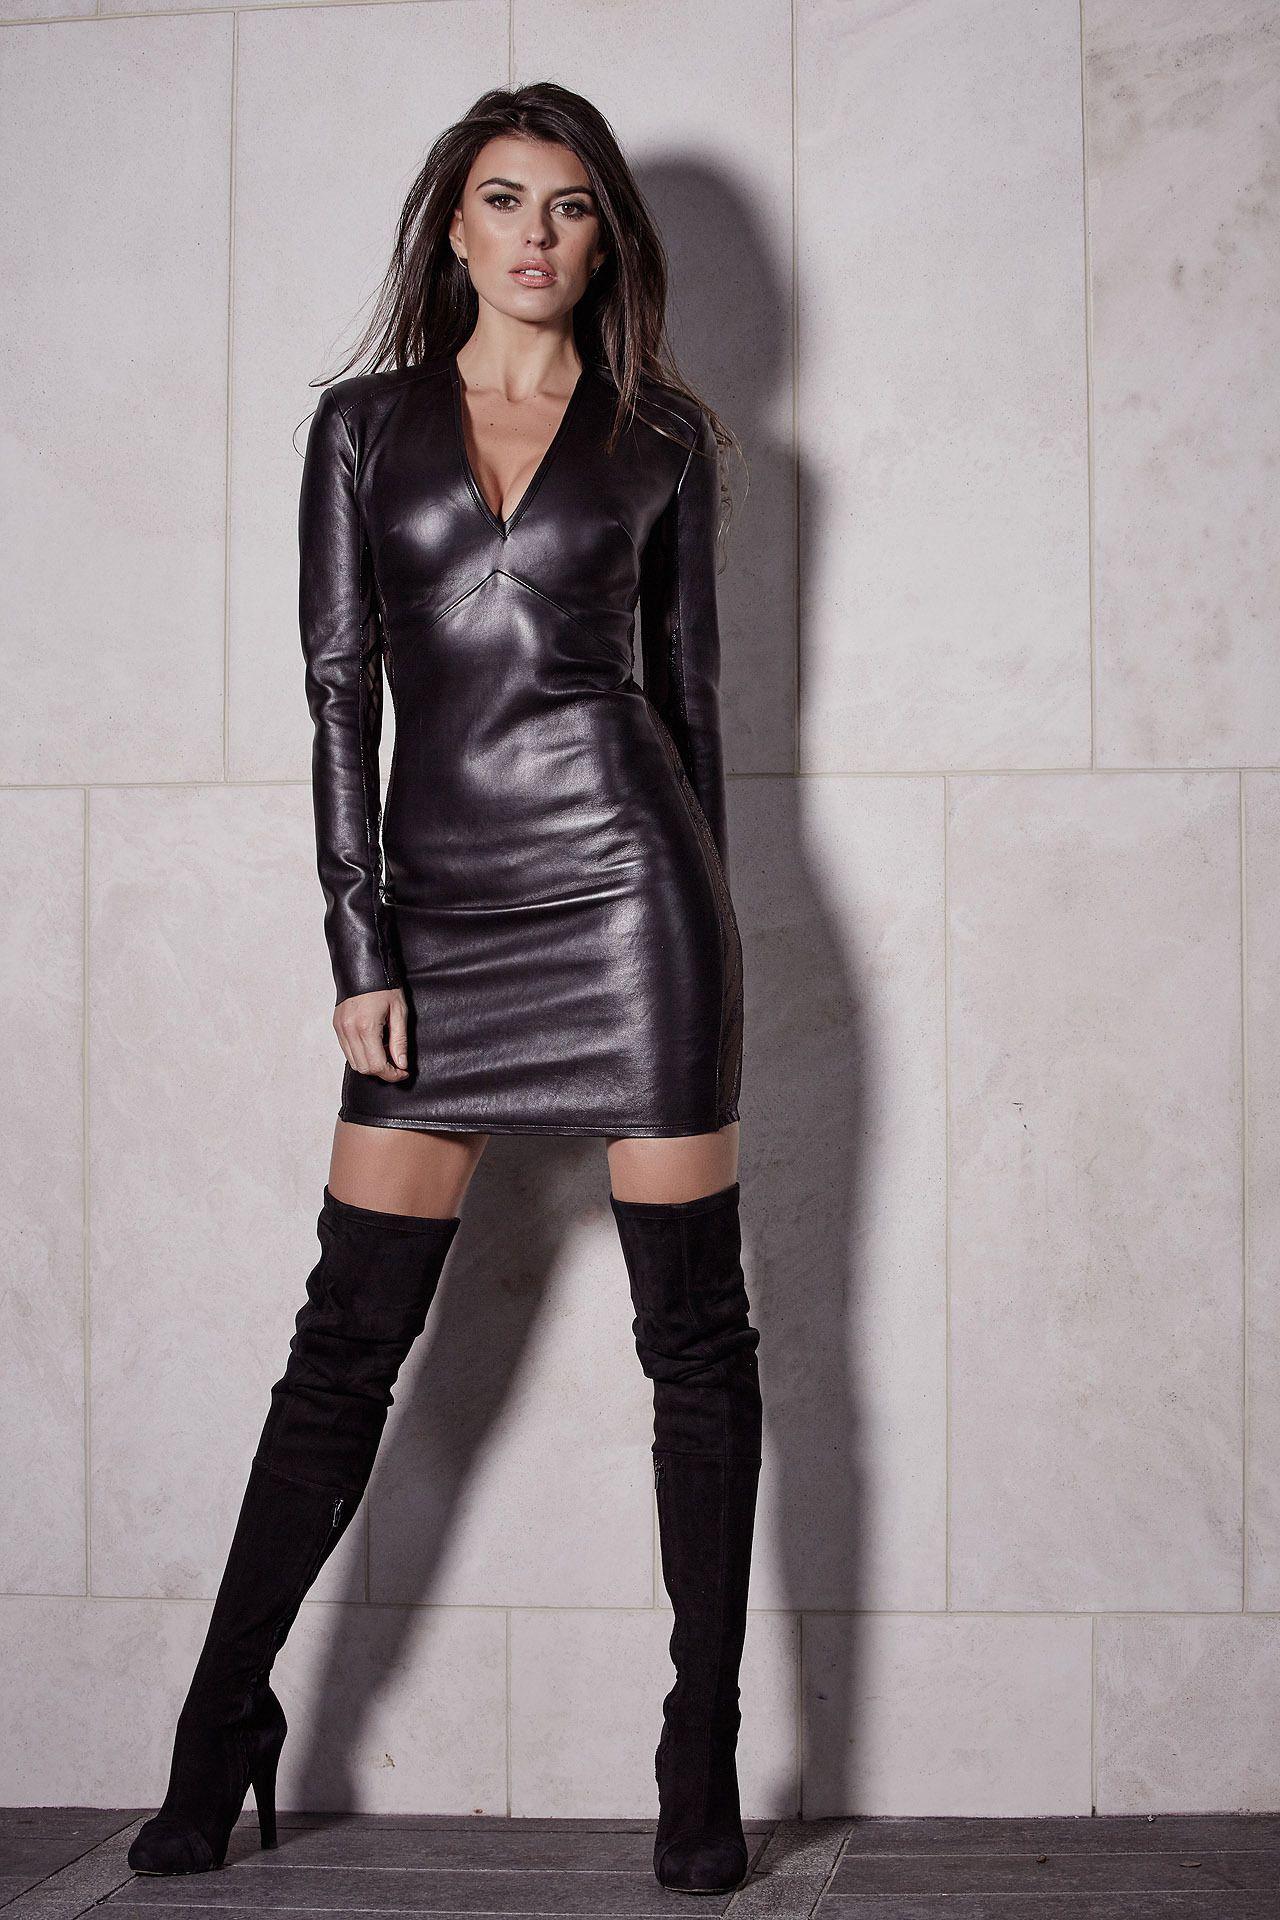 Slickcrust Isla Cruz Luxury Womenswear Brand Designed Crafted In London Leather Dresses Socialite Dress Leather Outfit [ 1920 x 1280 Pixel ]